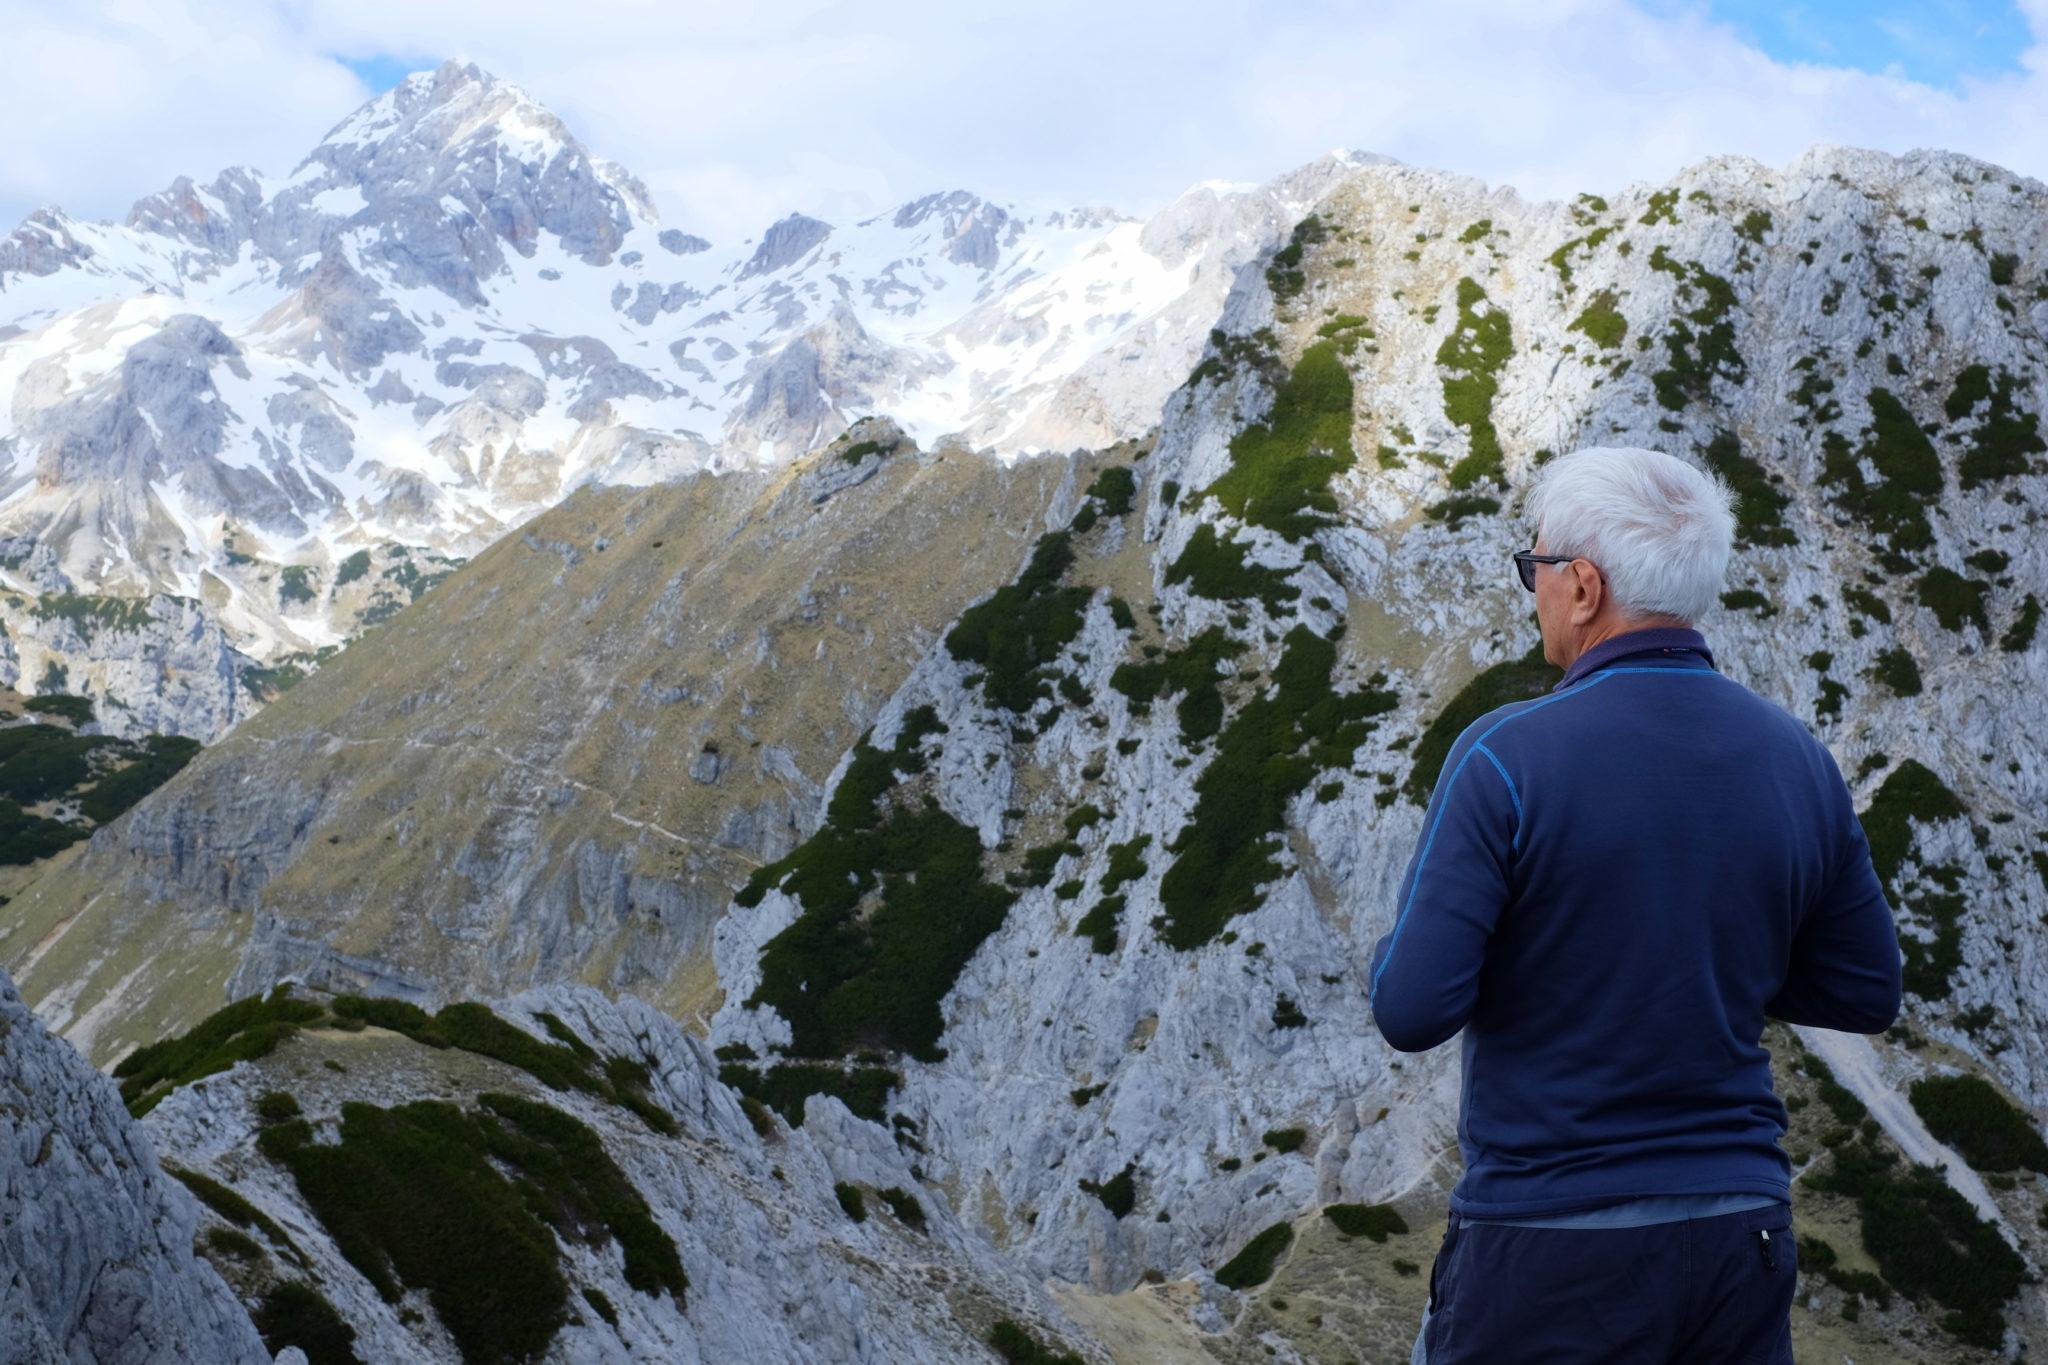 Hiking Viševnik, Slovenia, above Bled